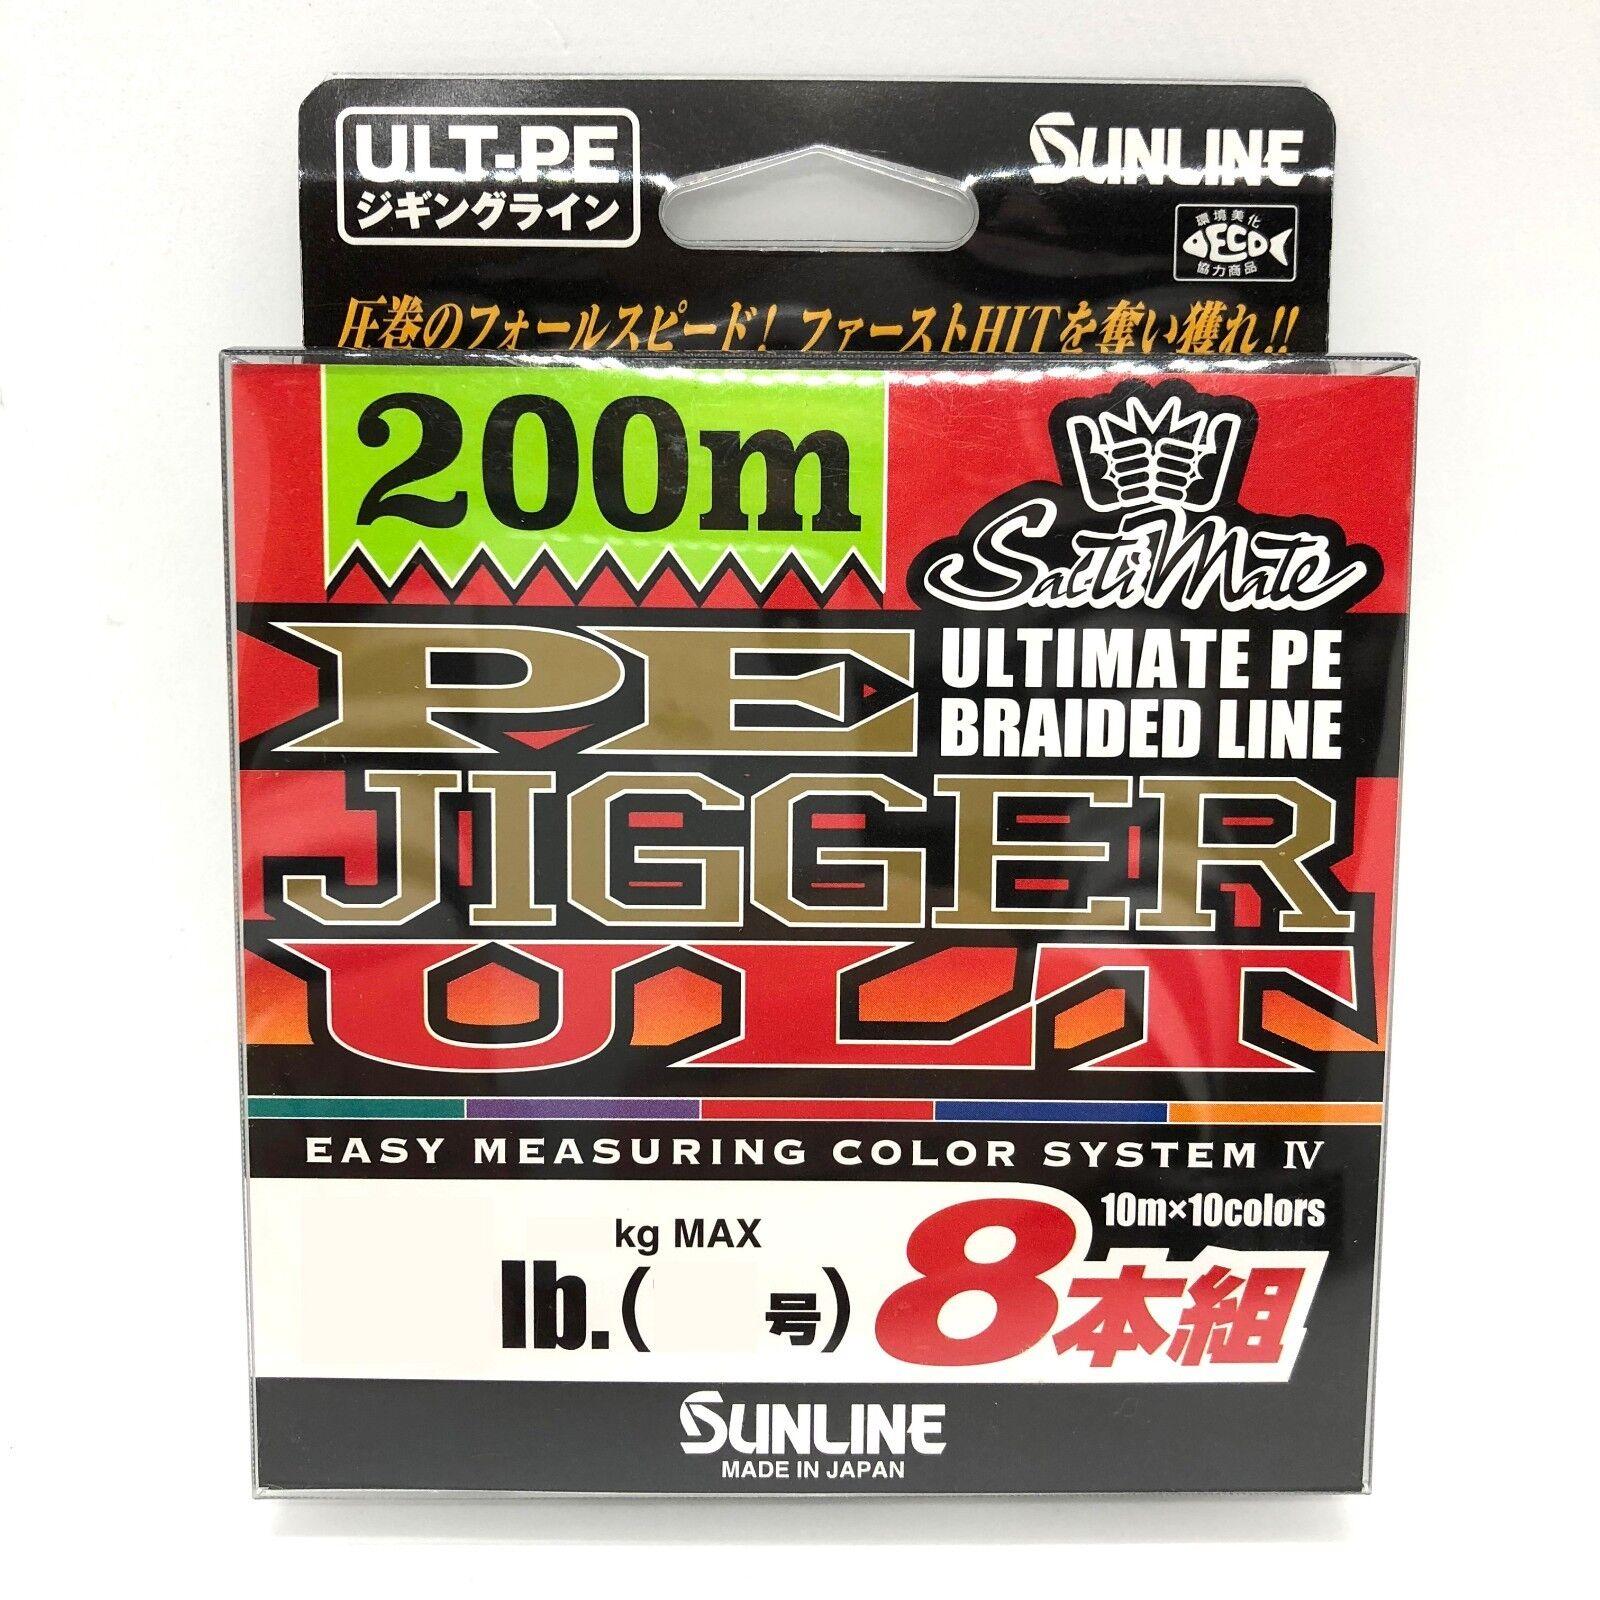 SUNLINE SaltiMate Line PE JIGGER ULT PE X8 Braided Line SaltiMate 200m Select LB 20a600